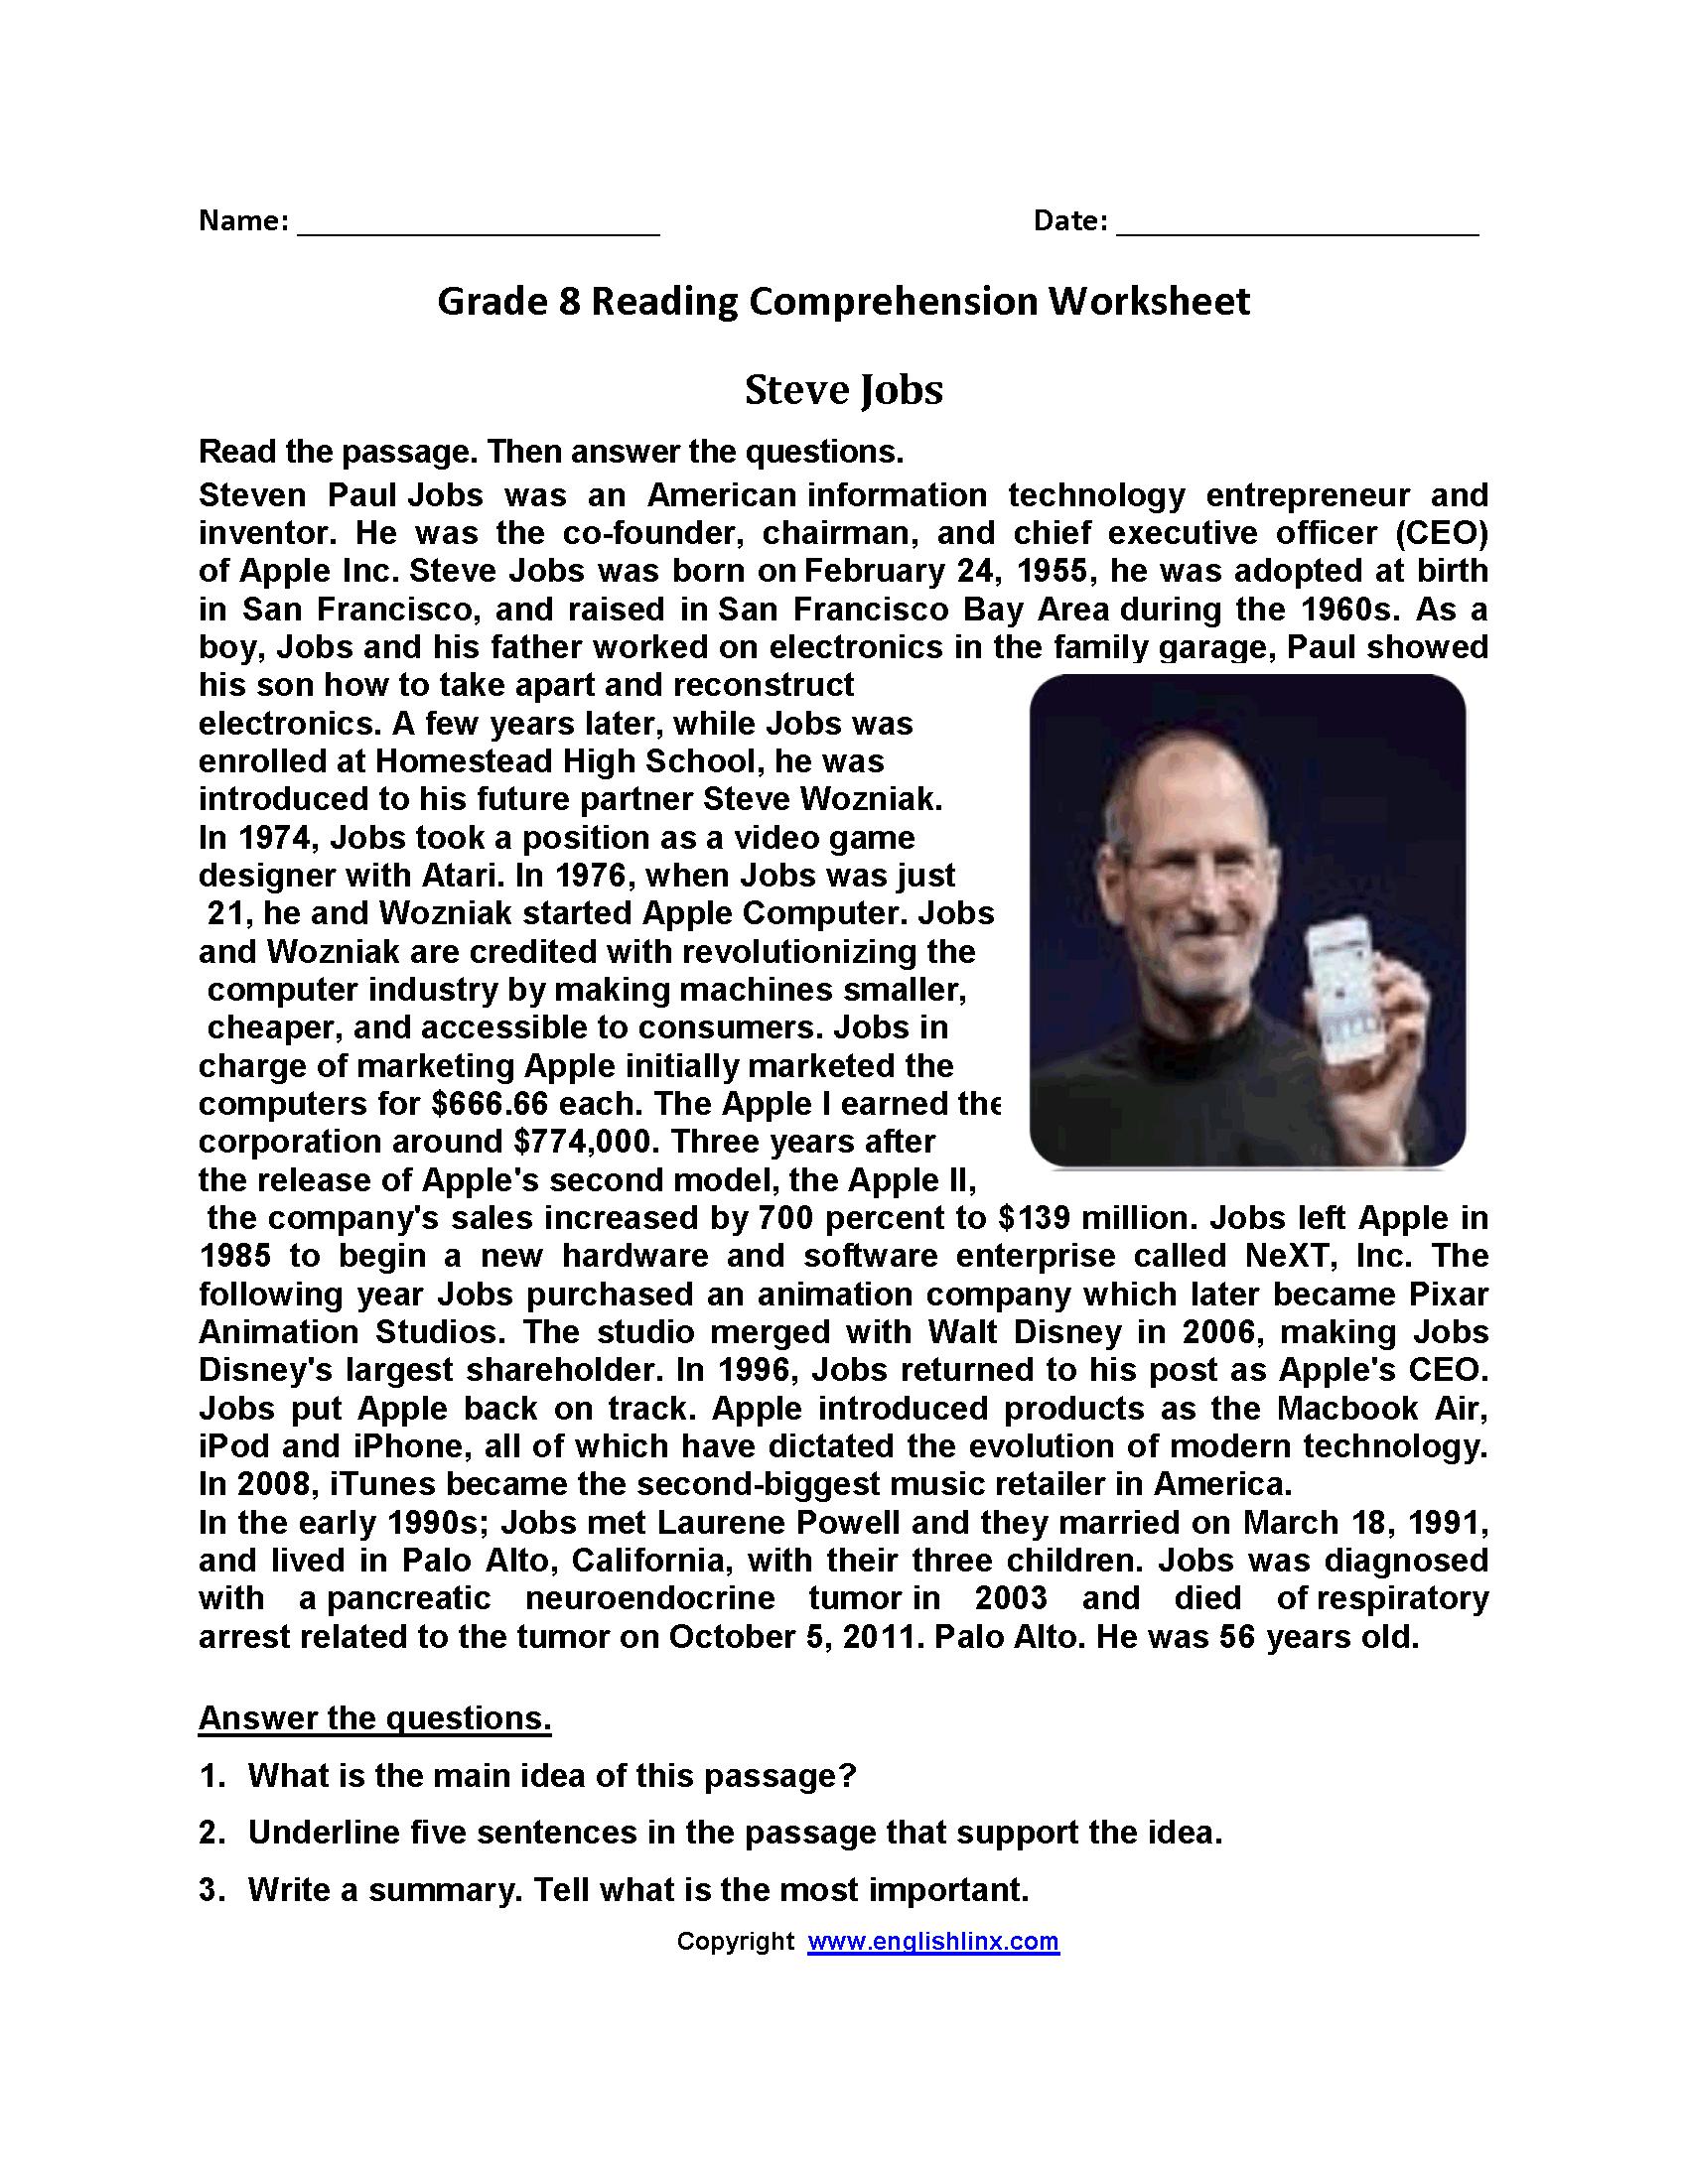 Steve Jobs Eighth Grade Reading Worksheets   Reading worksheets [ 2200 x 1700 Pixel ]